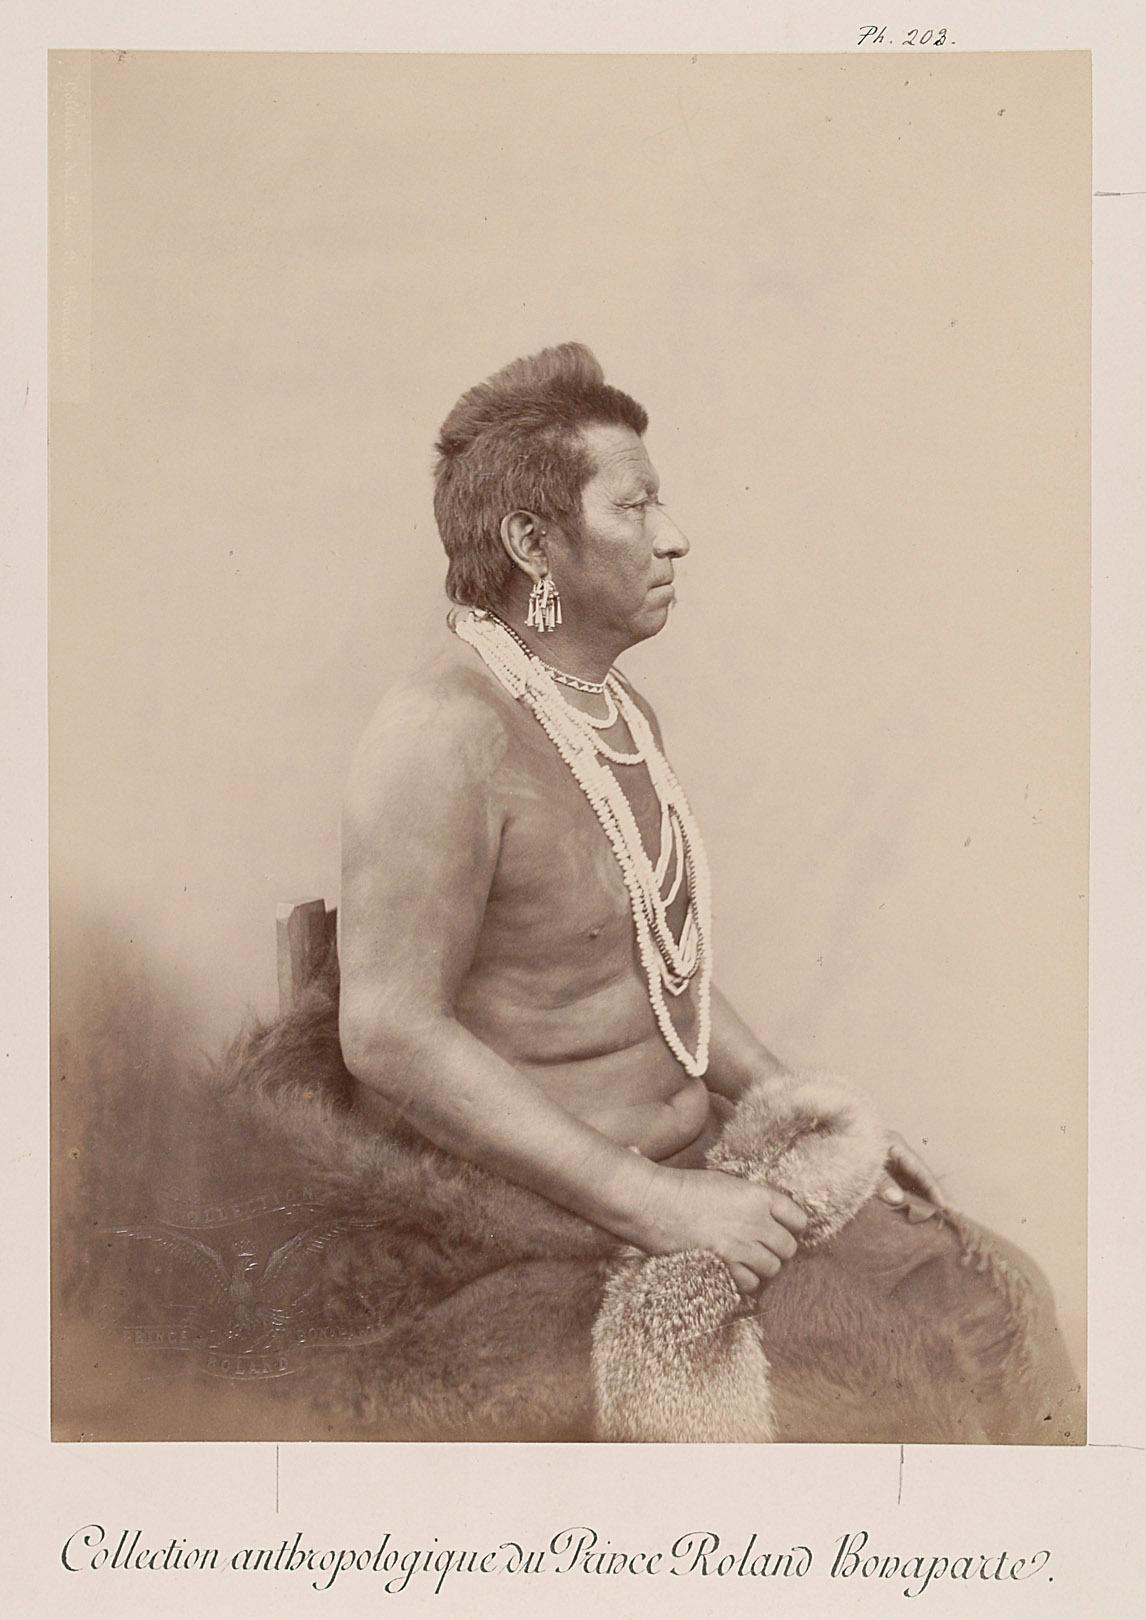 Bright-Eye - Inshta-labi, Mann, Profilansicht von Prinz Roland Napoléon Bonaparte